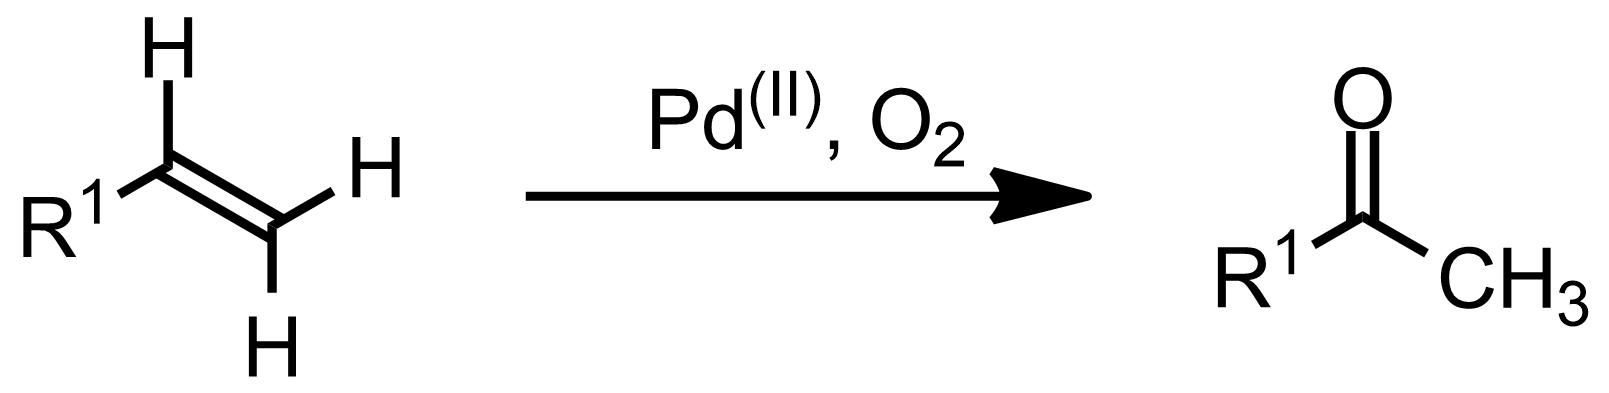 Schematic representation of the Wacker Oxidation.